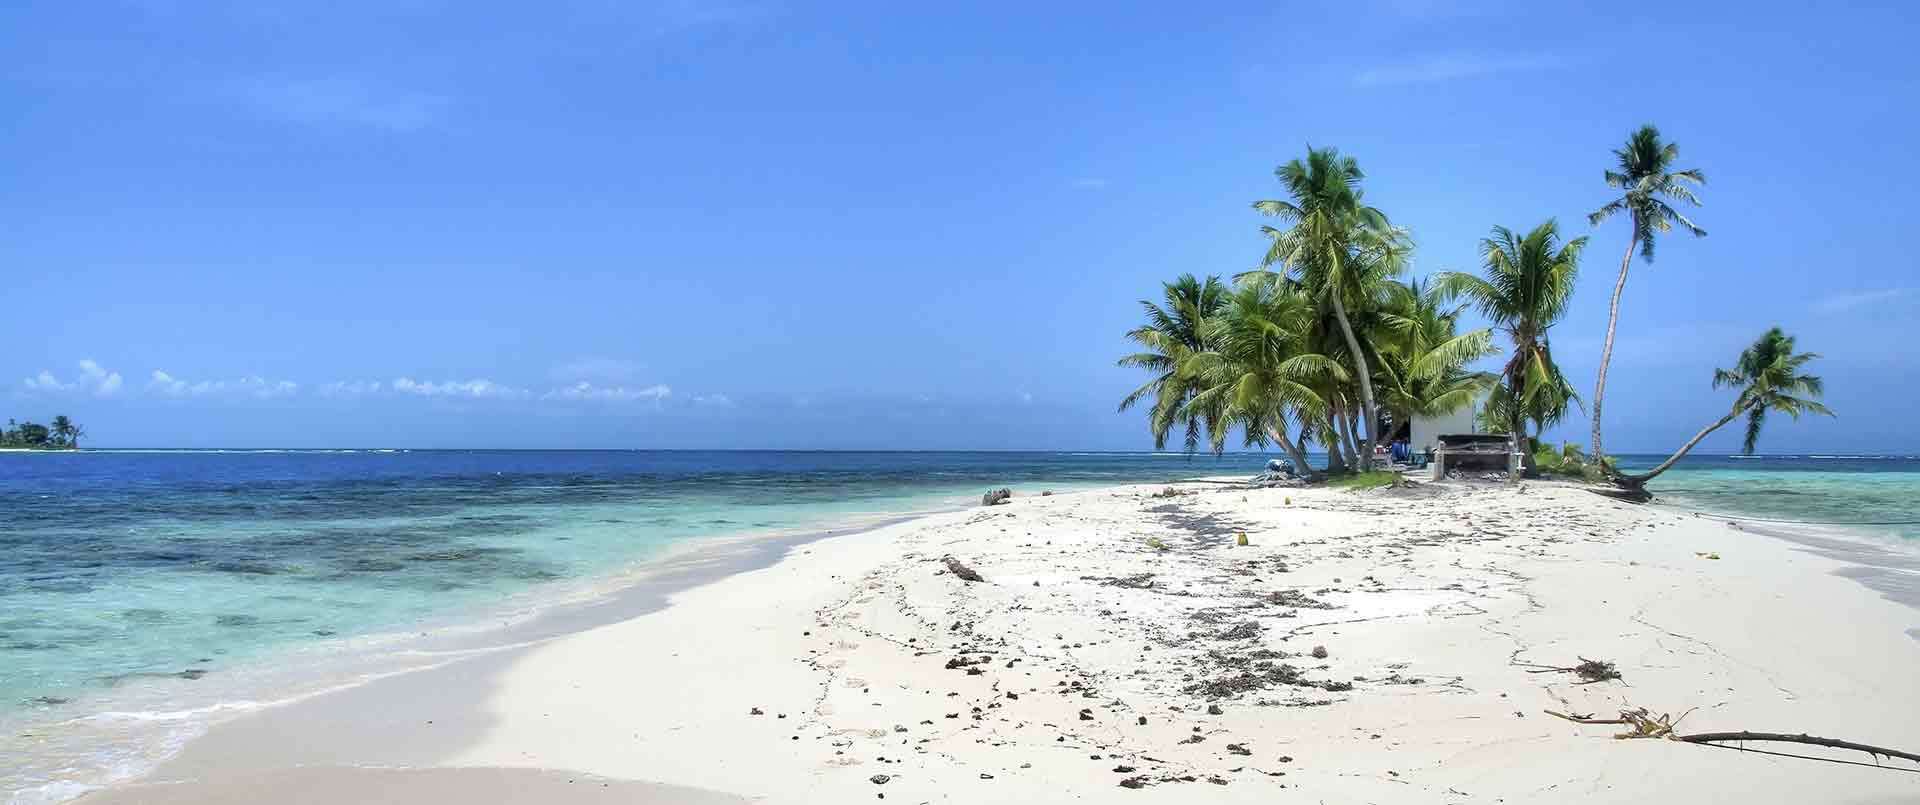 Belize for the Connoisseur